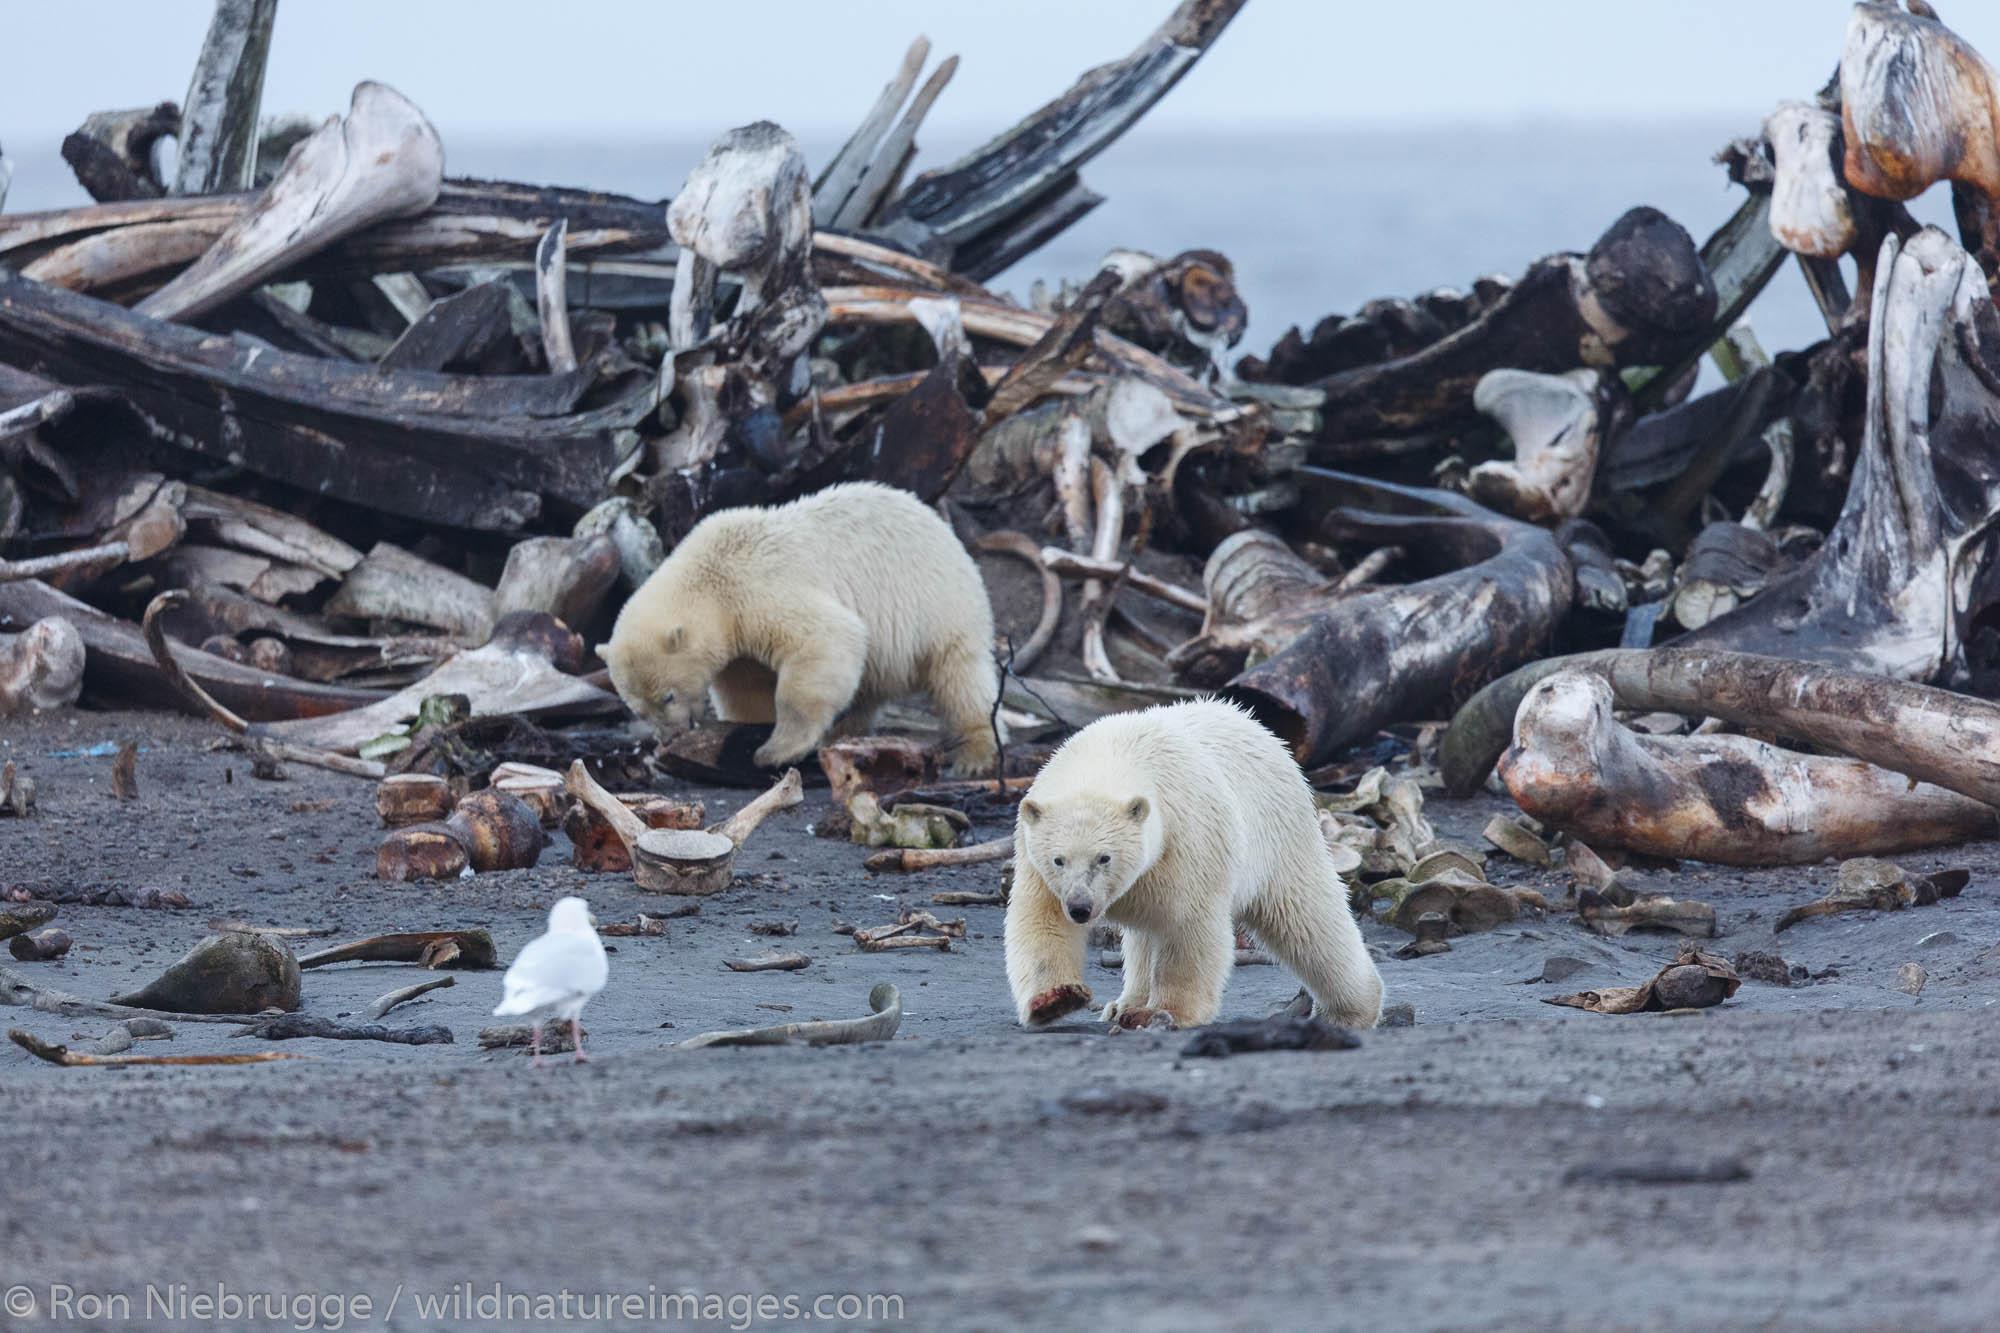 Polar bears (Ursus maritimus) at a whale bone pile,  Arctic National Wildlife Refuge, Alaska.